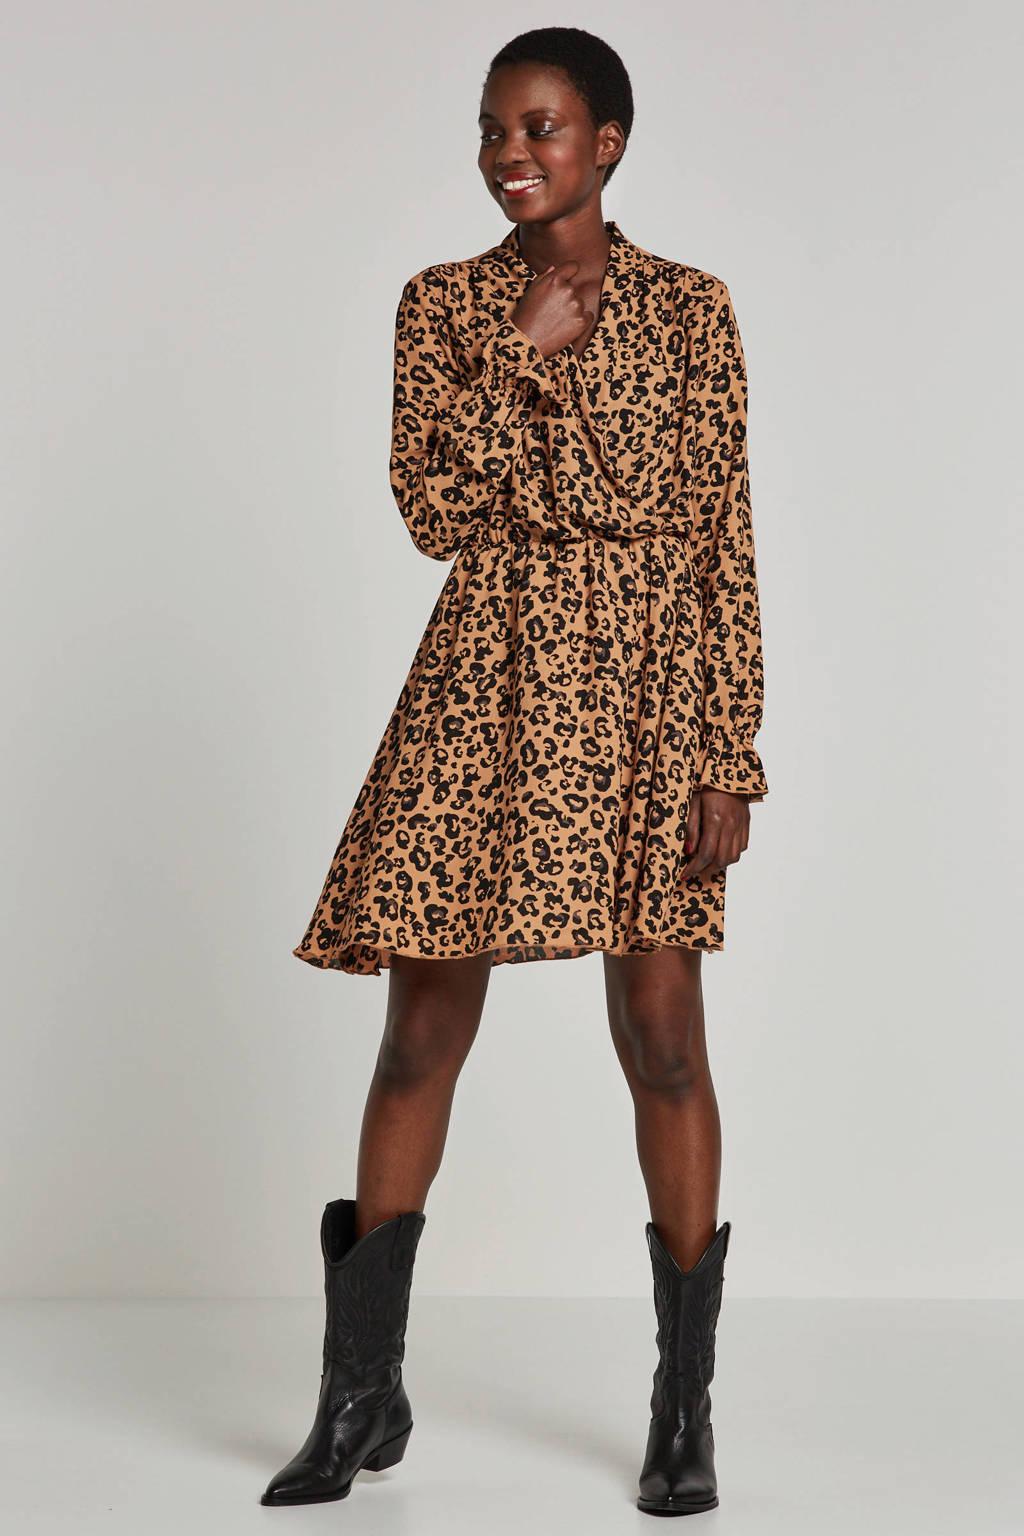 0781a4f9 AWARE by VERO MODA jurk met panterprint en overslagkraag, Bruin/zwart